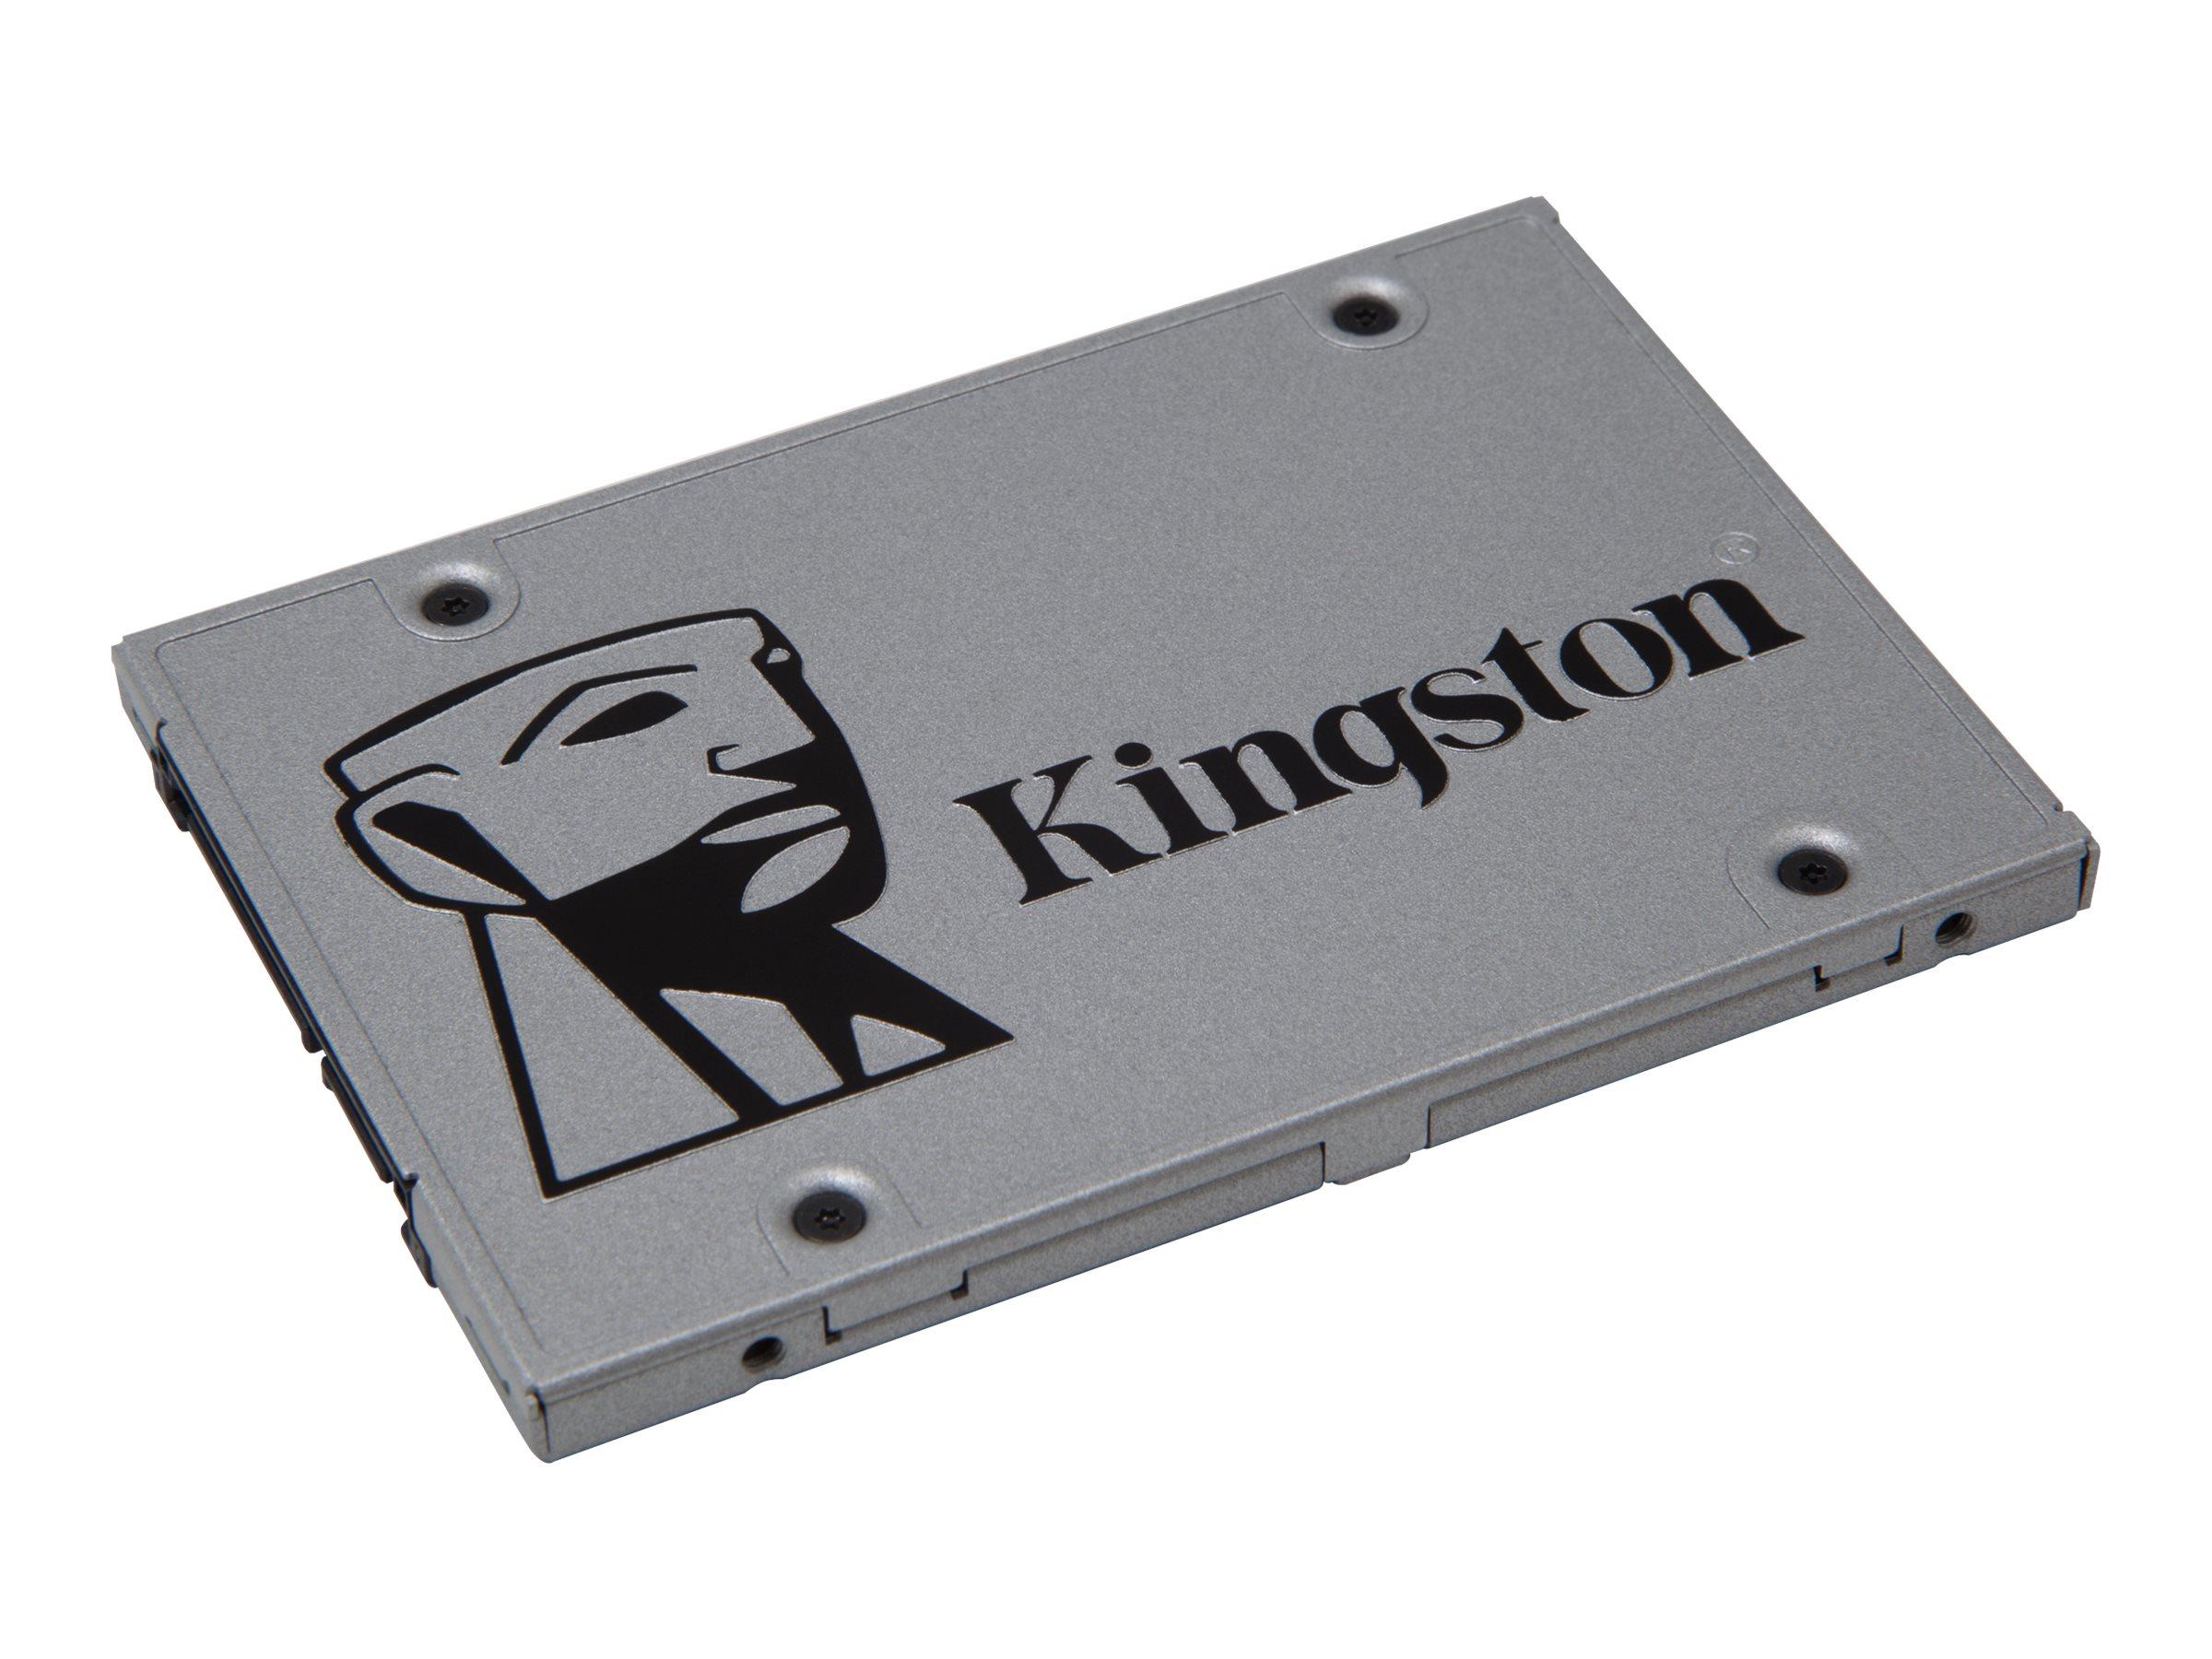 KINGSTON SSDNOW UV400 UNIDAD EN ESTADO SOLIDO 240